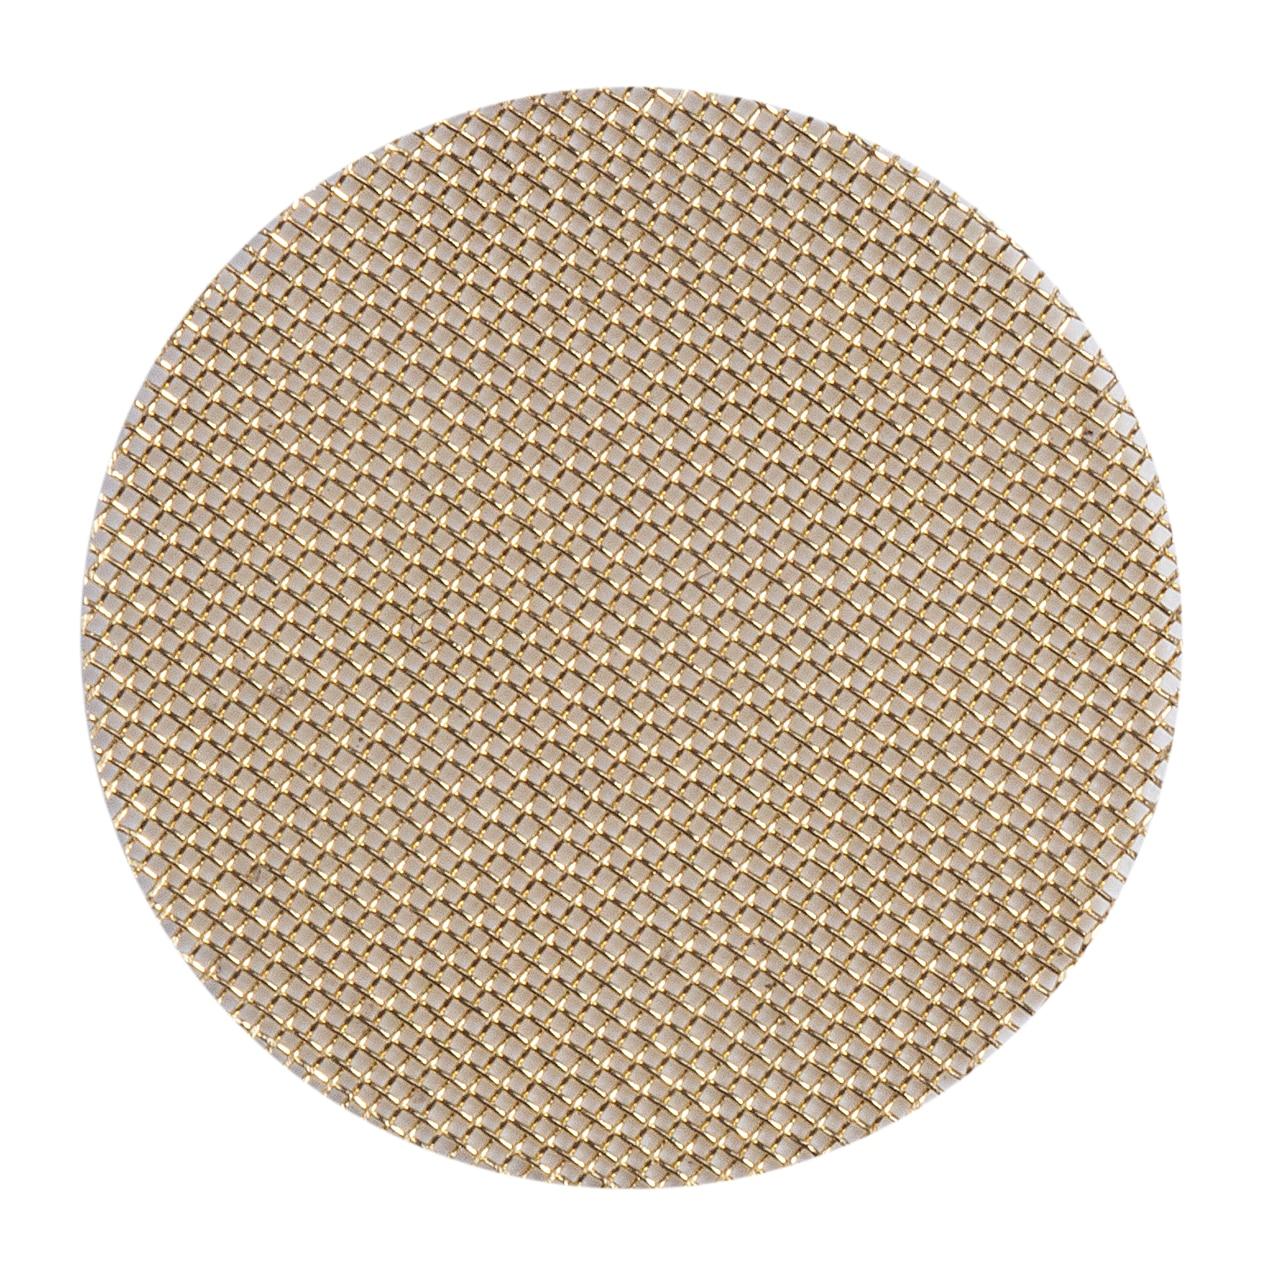 2018 Nova Moda Malha Filtro 20mm 100 x Tubo de Filtros de Tela De Malha De Bronze Gold & Bronze Filtros de Alta Qualidade